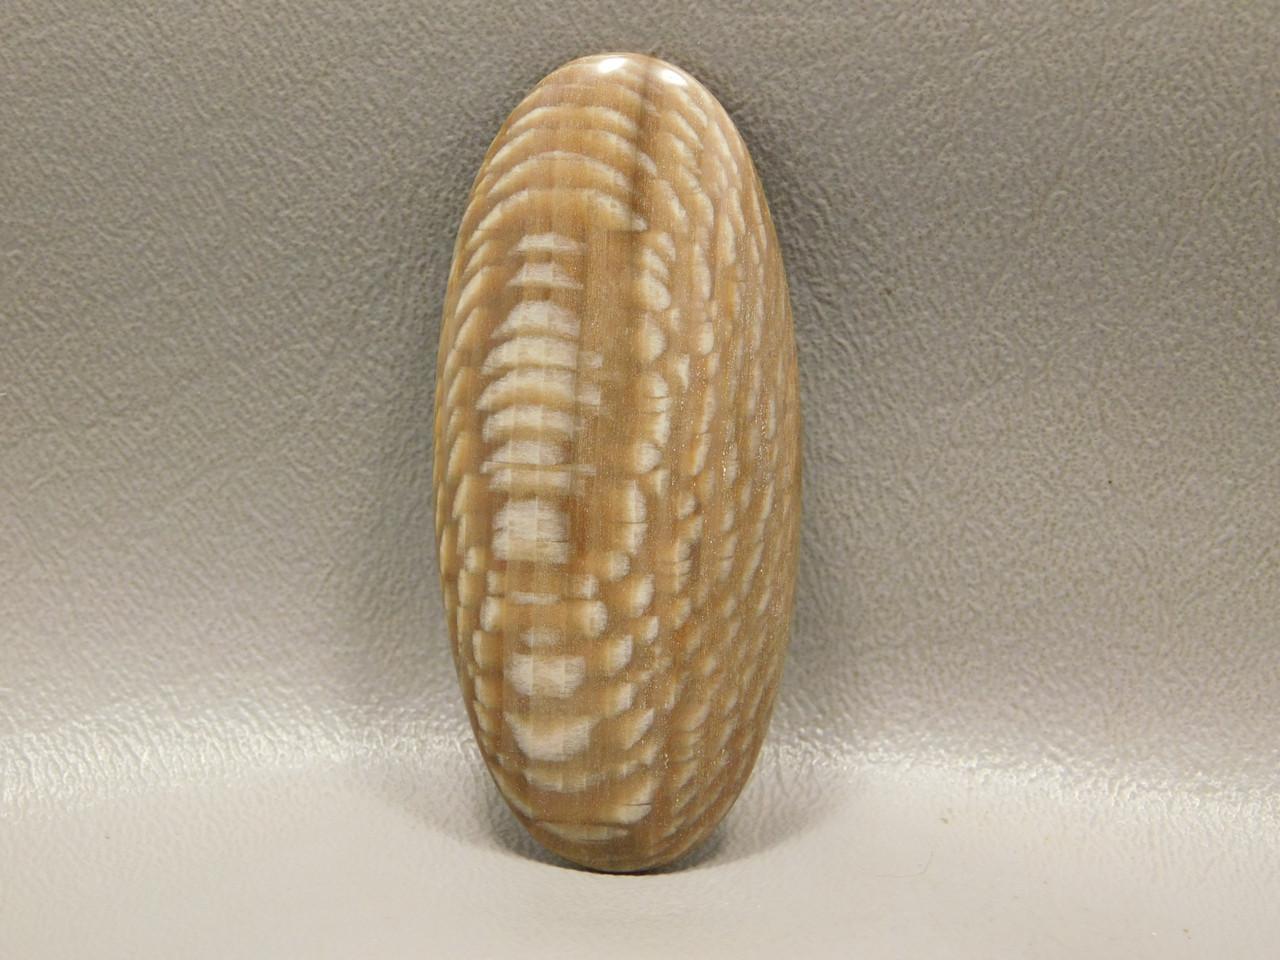 Petrified Wood Badger Creek Sycamore Stone Designer Cabochon #1